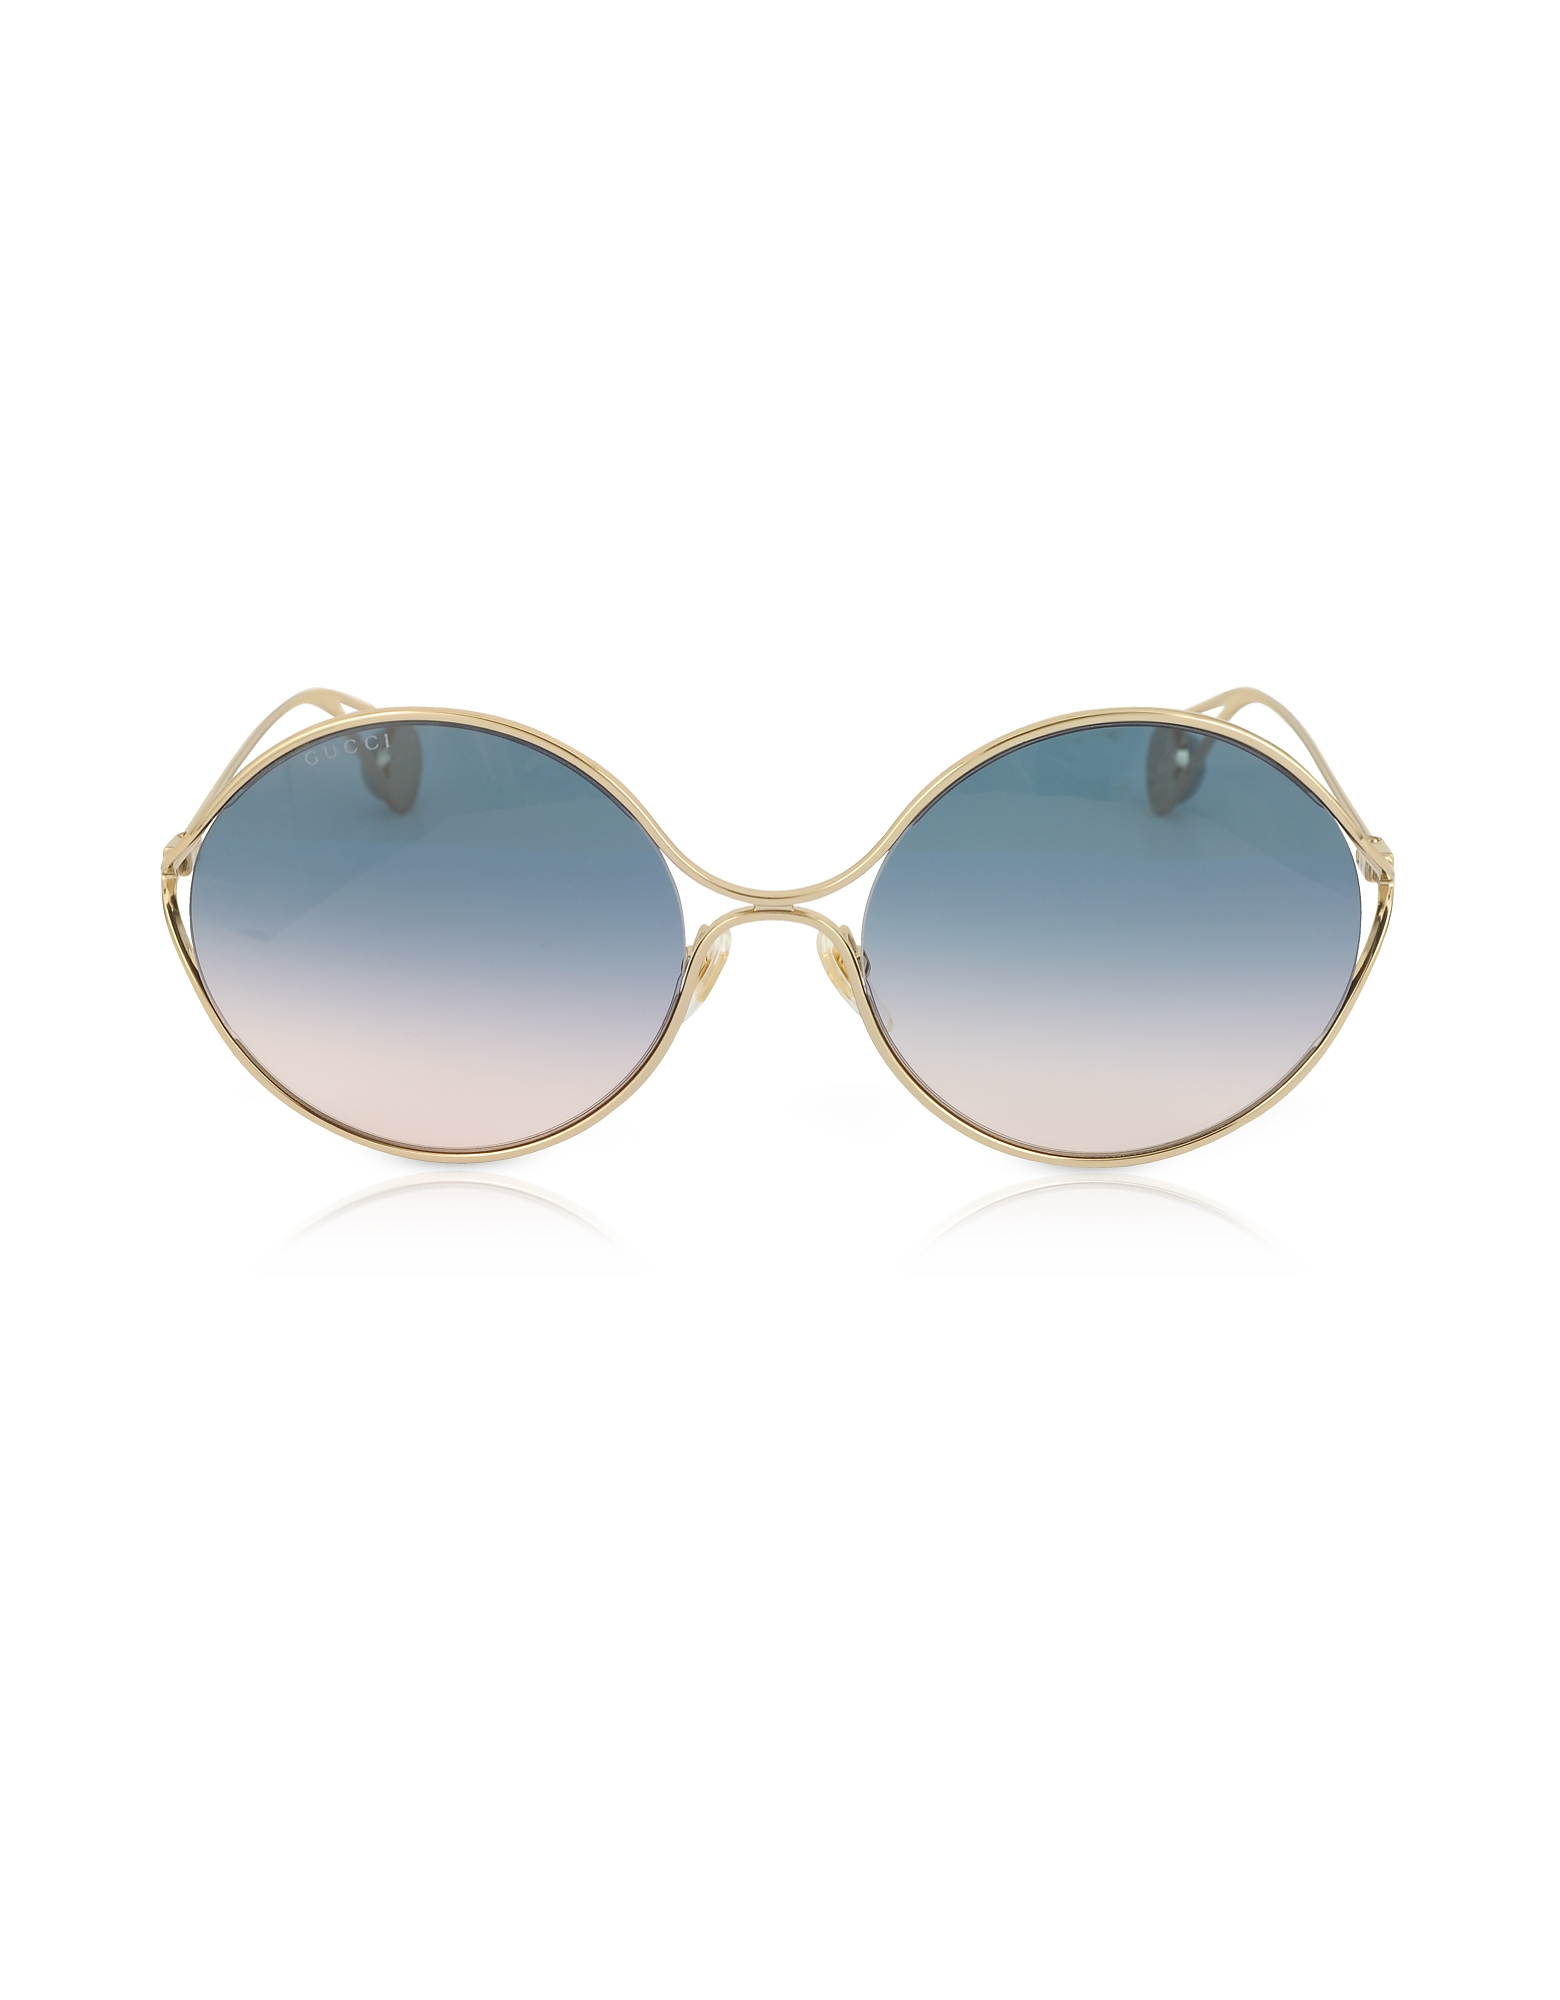 Gucci Designer Sunglasses, GG0253S Round-frame Metal Sunglasses w/GG Pearls